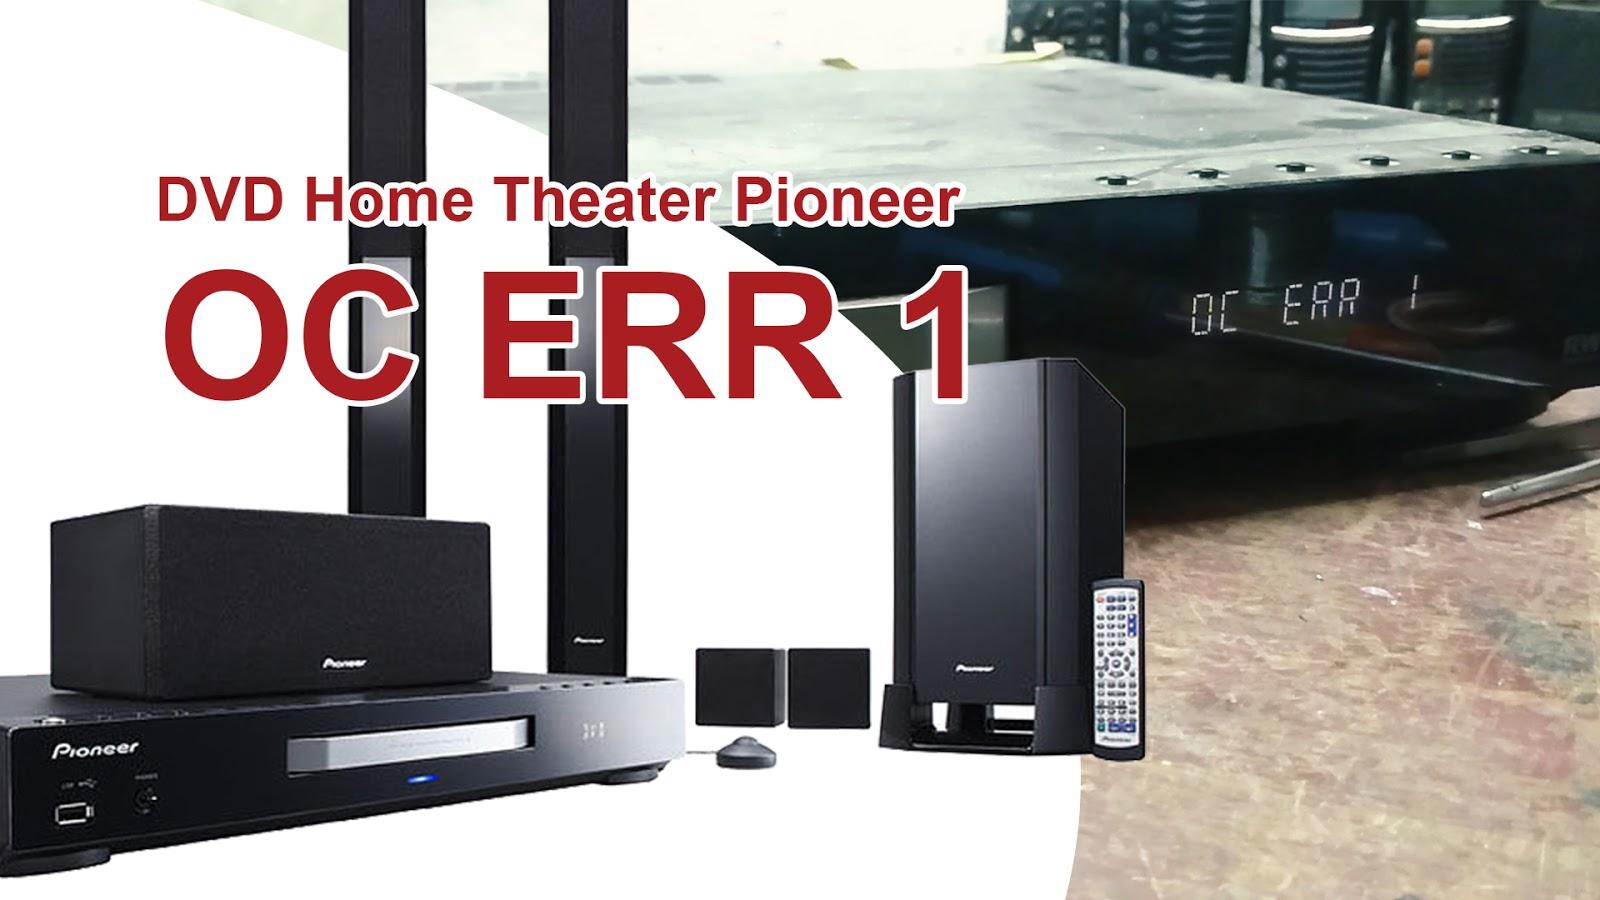 Servis DVD Home Theater Pioneer HTZ-565 OC ERR 1